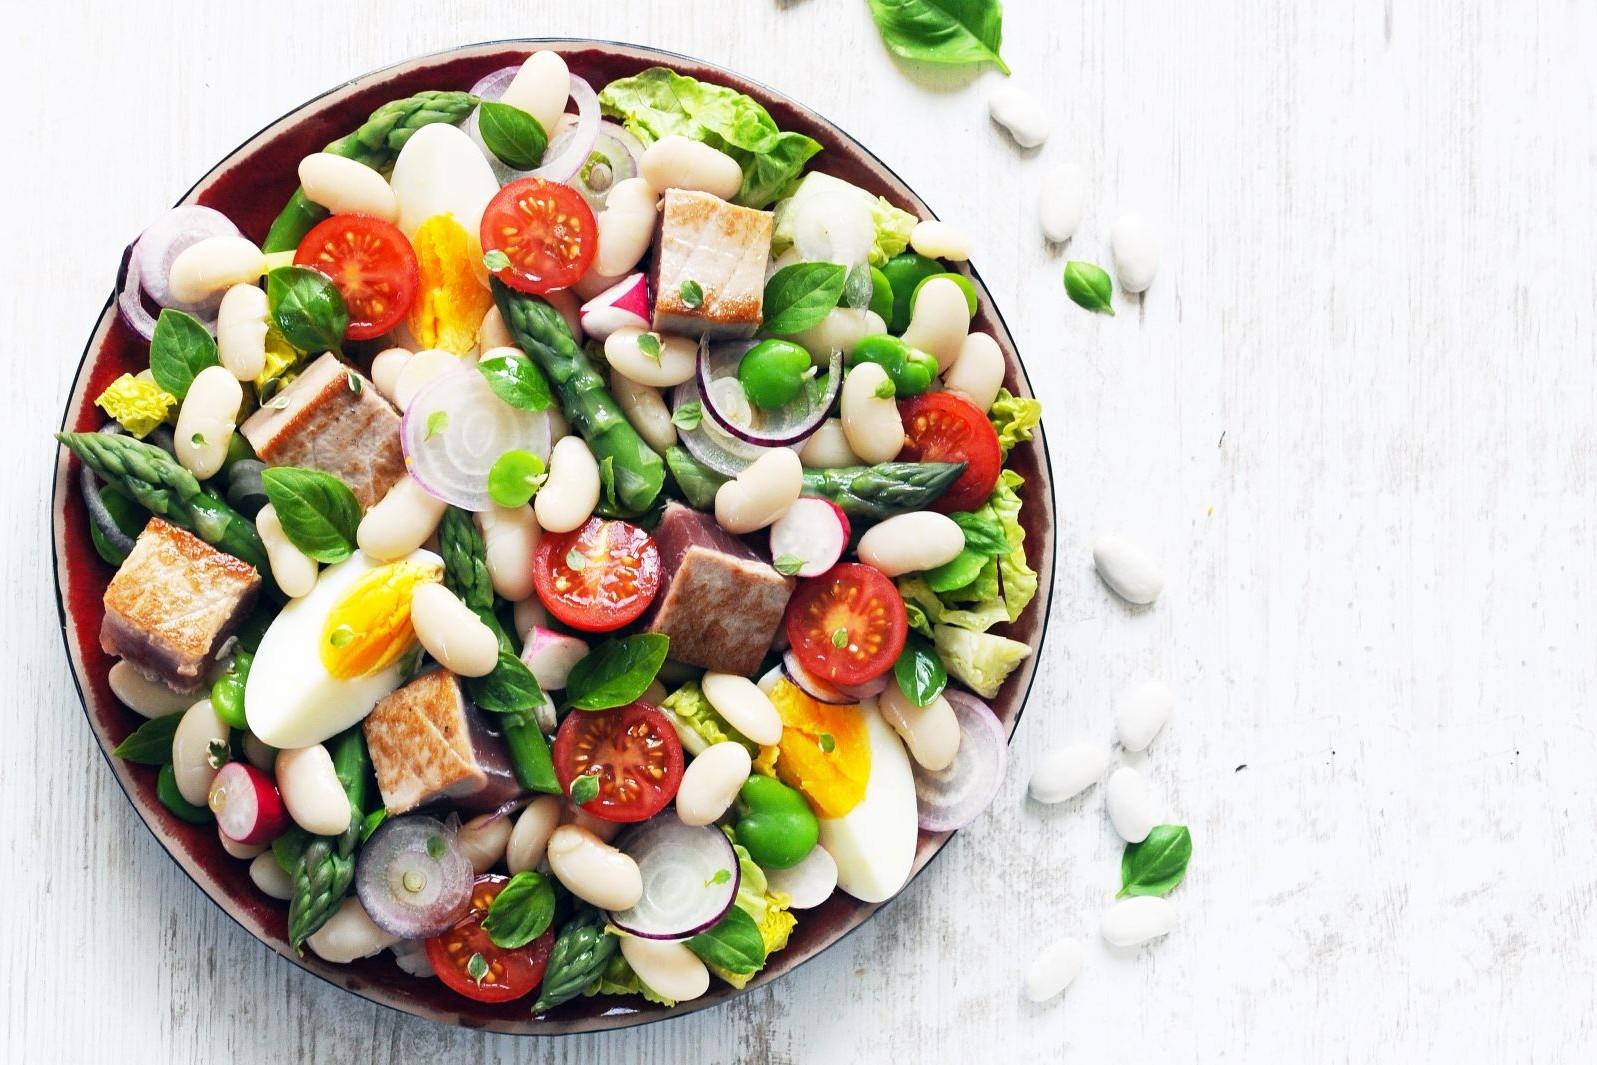 Salade nicoise aux Haricots Tarbais - Dorian Nieto